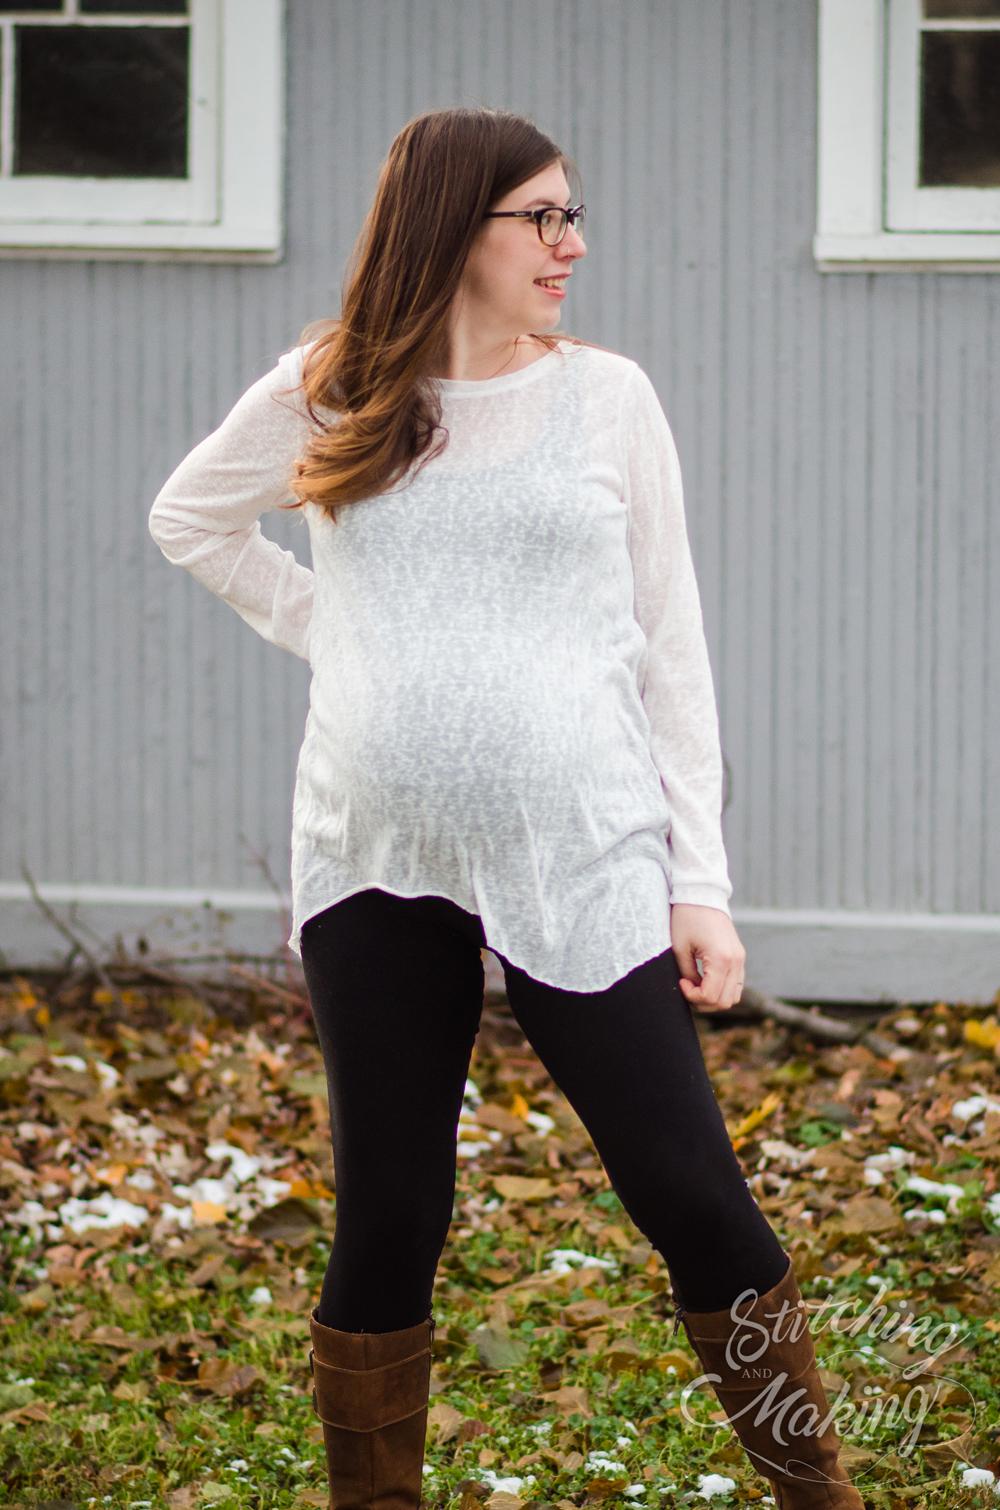 Pregnant Elisabeth in Frankie Mae Top